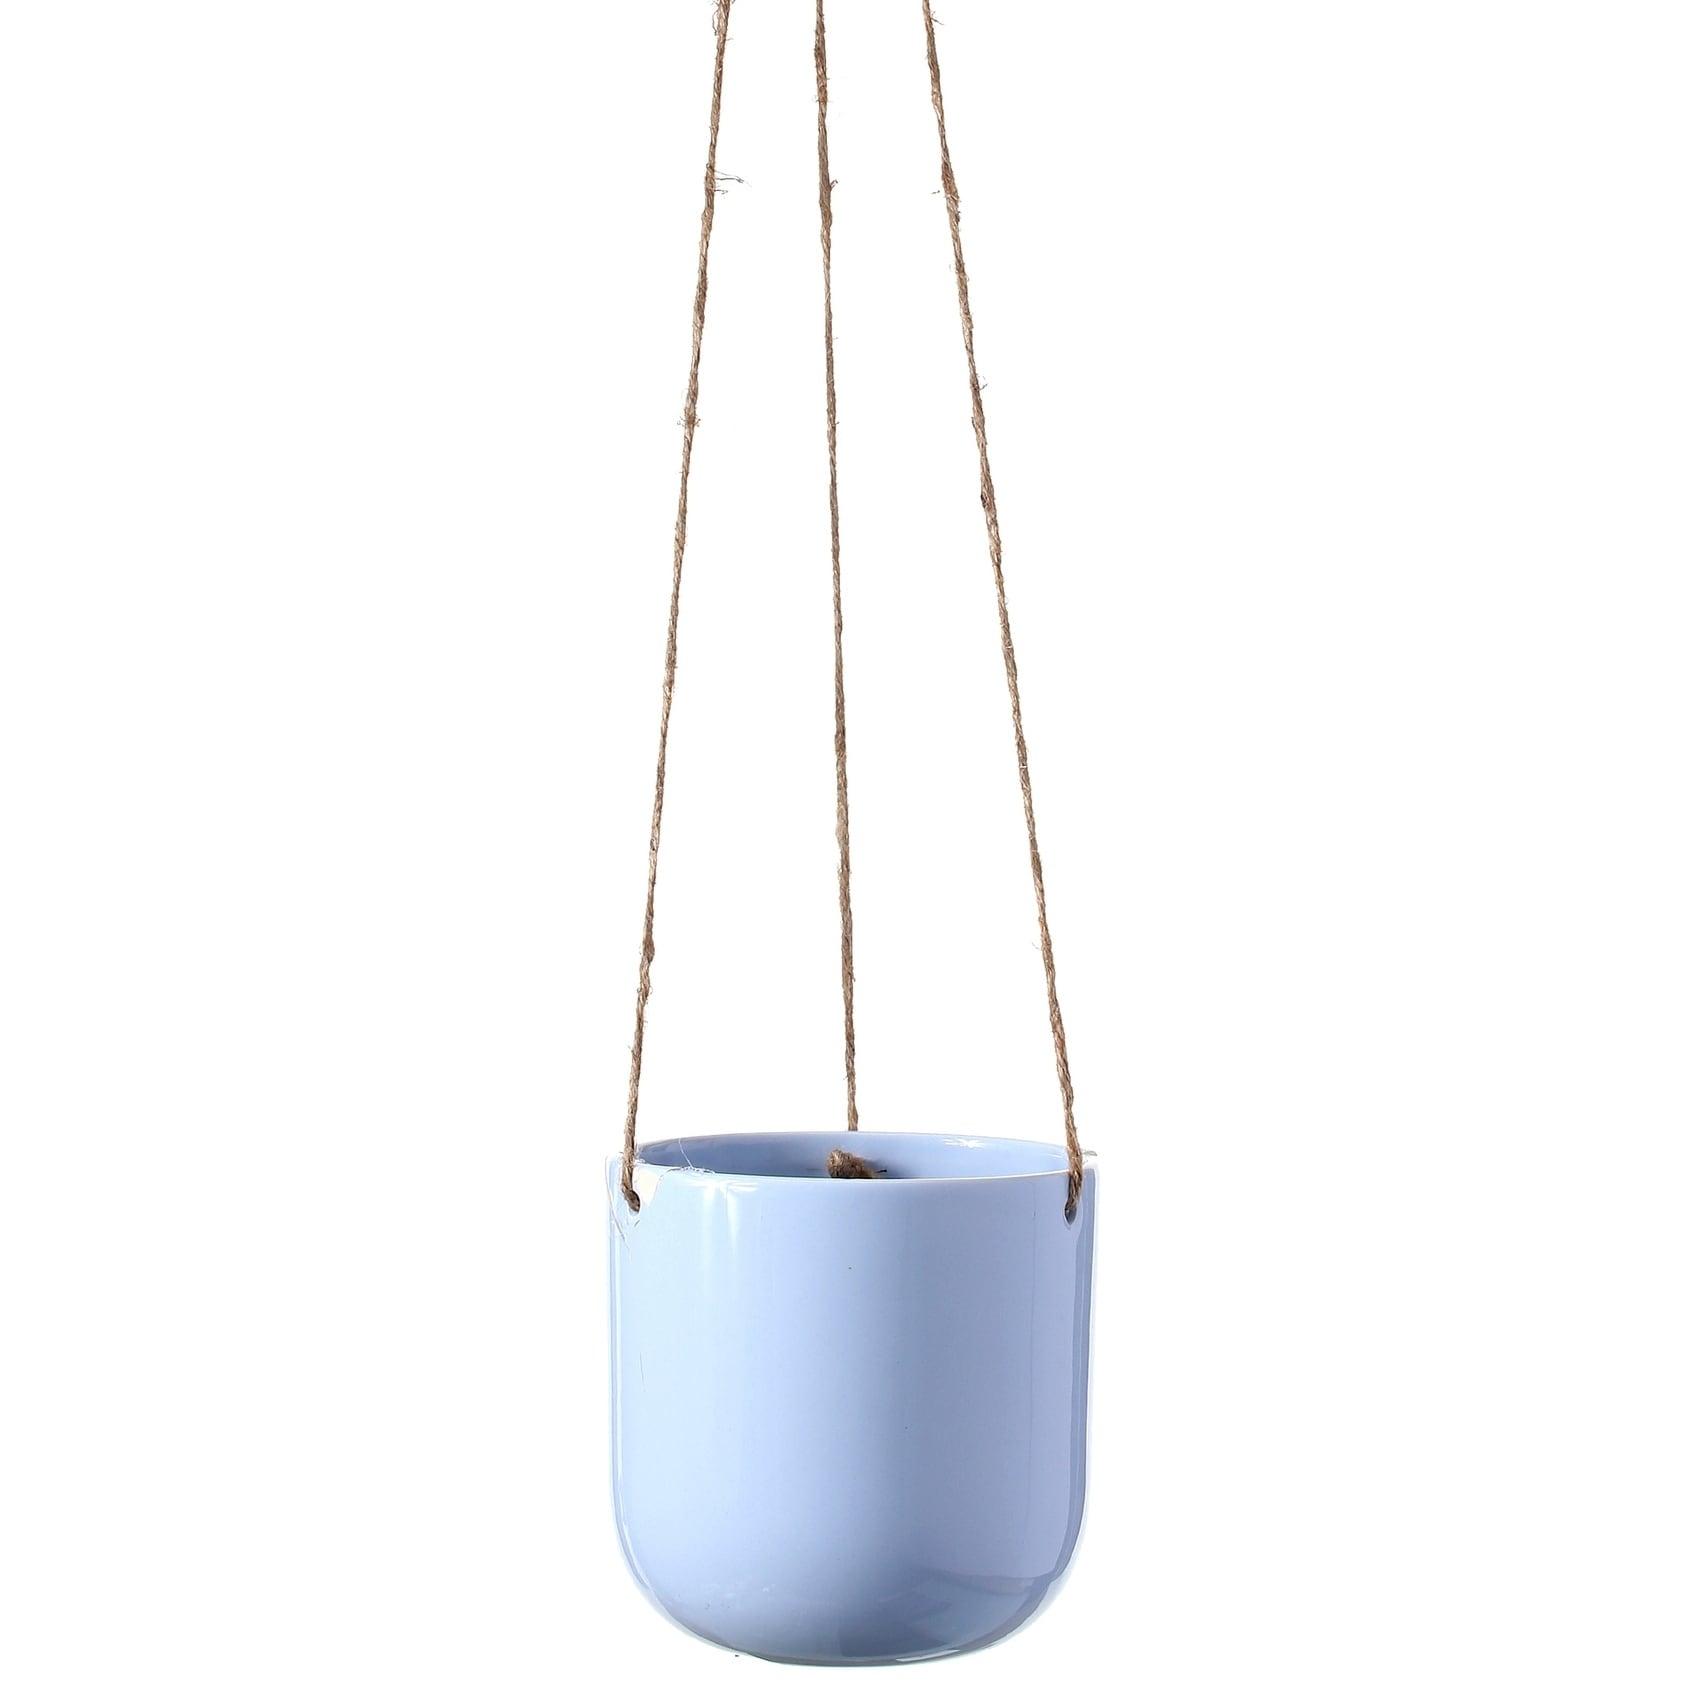 Ceramic Shiny Hanging Planter 5 x 5 x 35 (Blue)